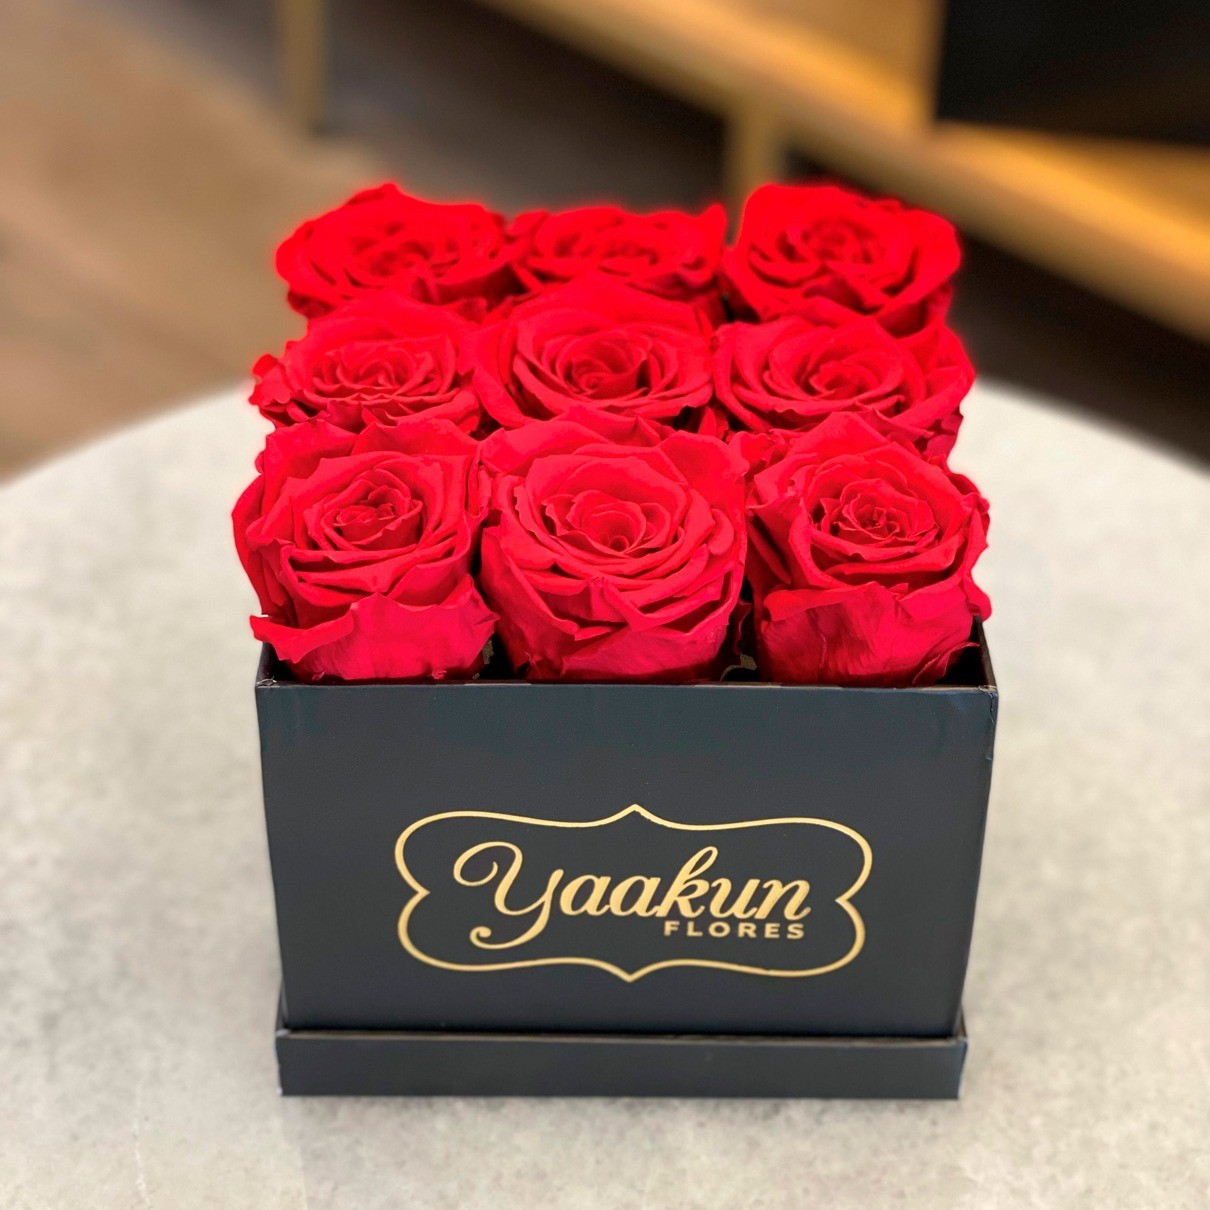 Rosas eternas en caja cuadrada negra chica rosas rojas